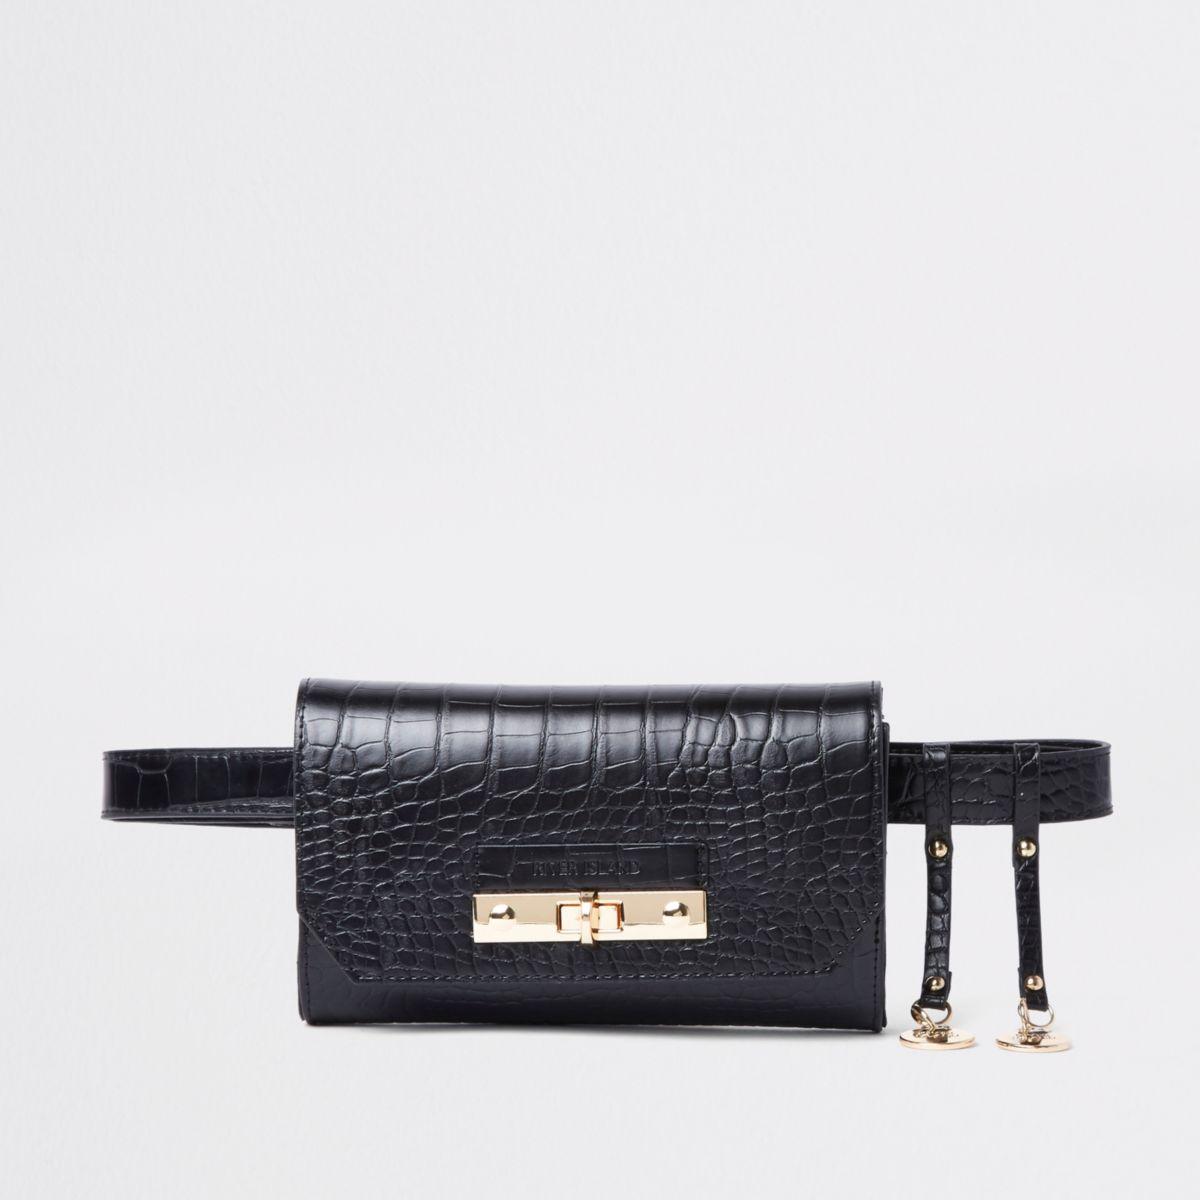 Zwart heuptasje met krokodillenprint, gesp en riem